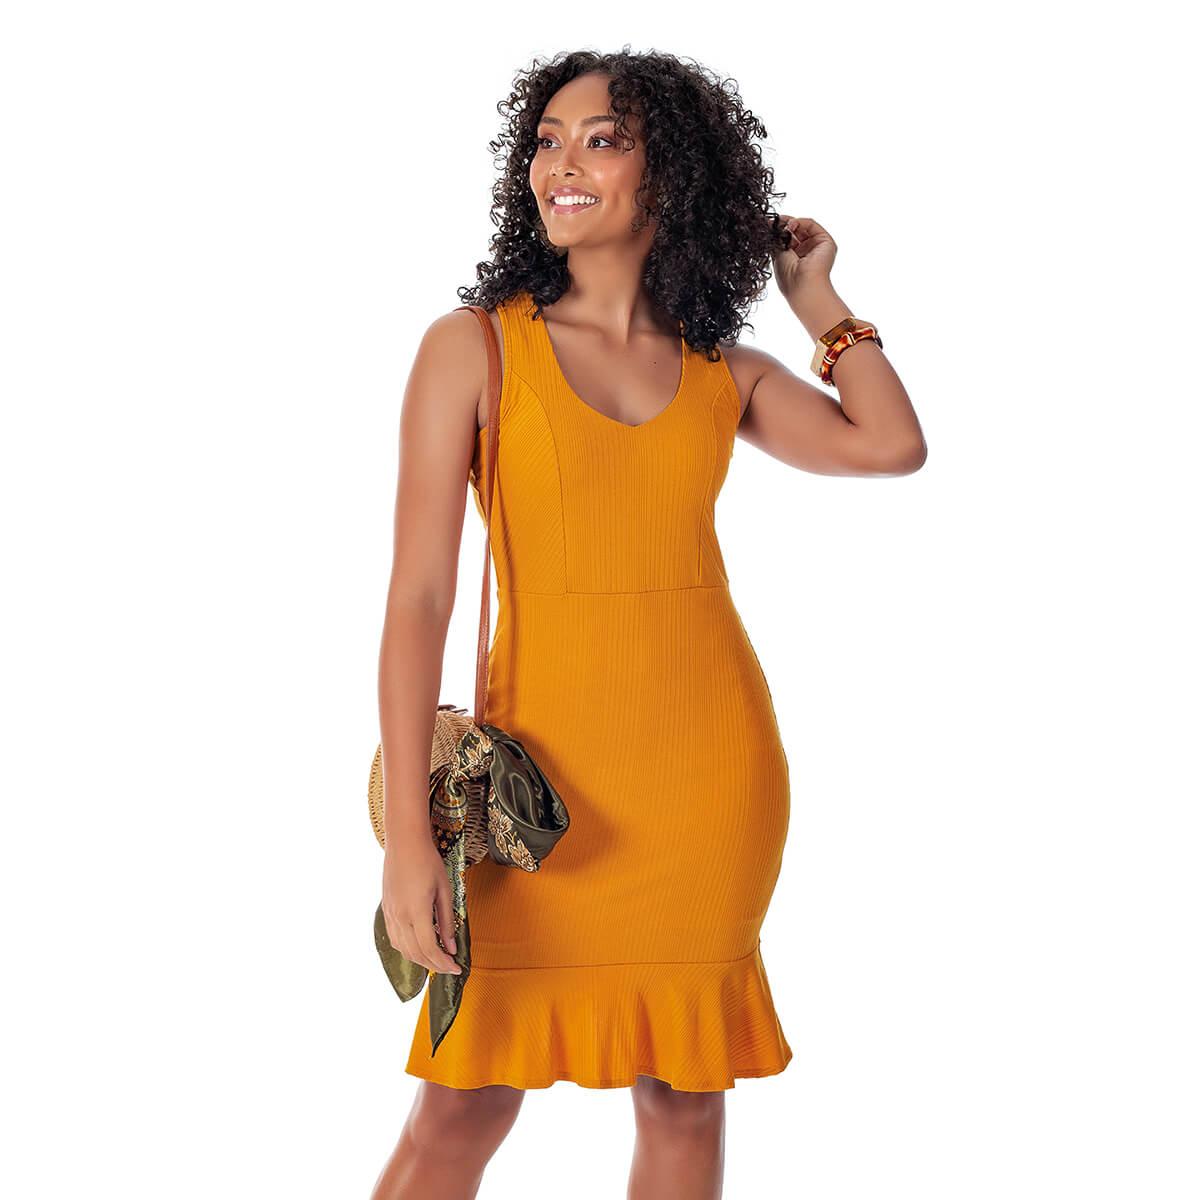 Vestido Feminino Curto Canelado Essencial